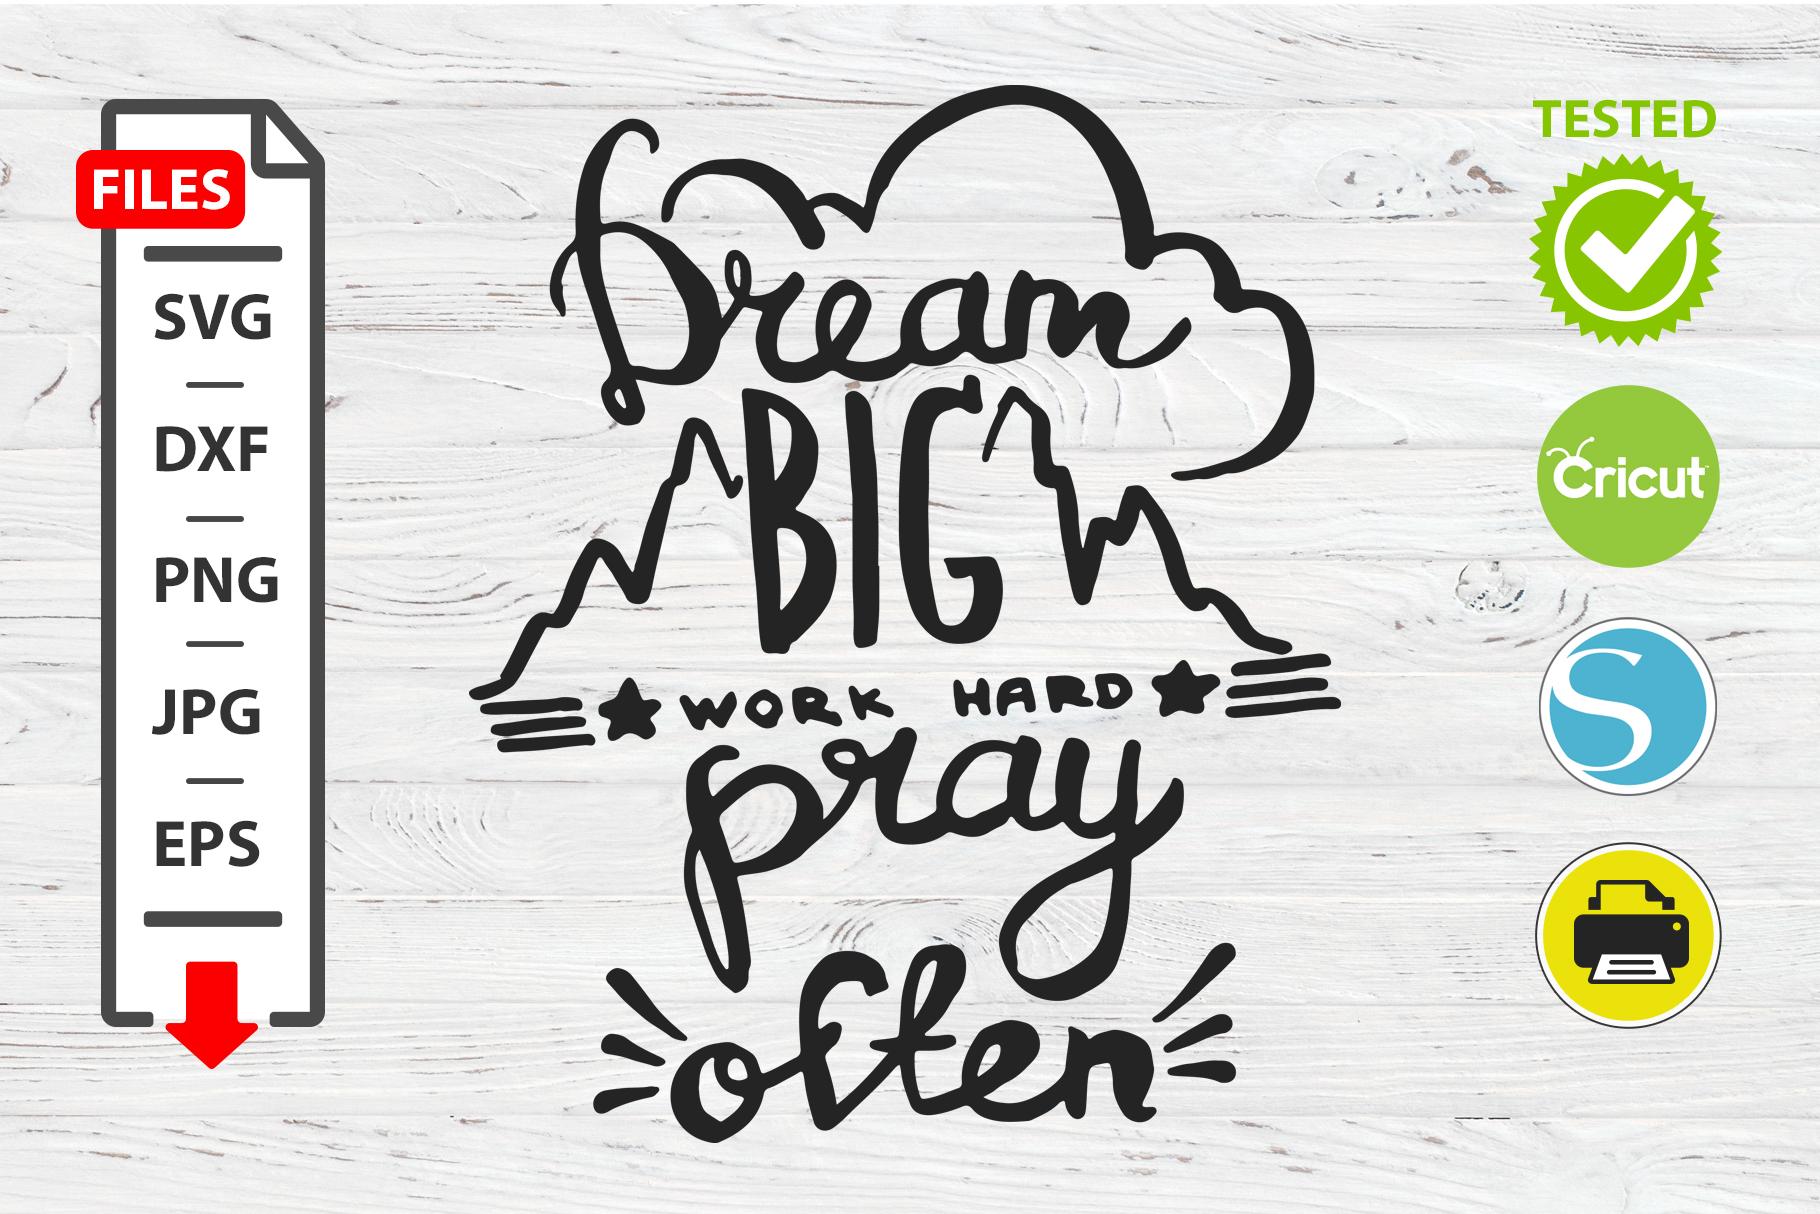 Dream big work motivational quote SVG Cricut Silhouette example image 1